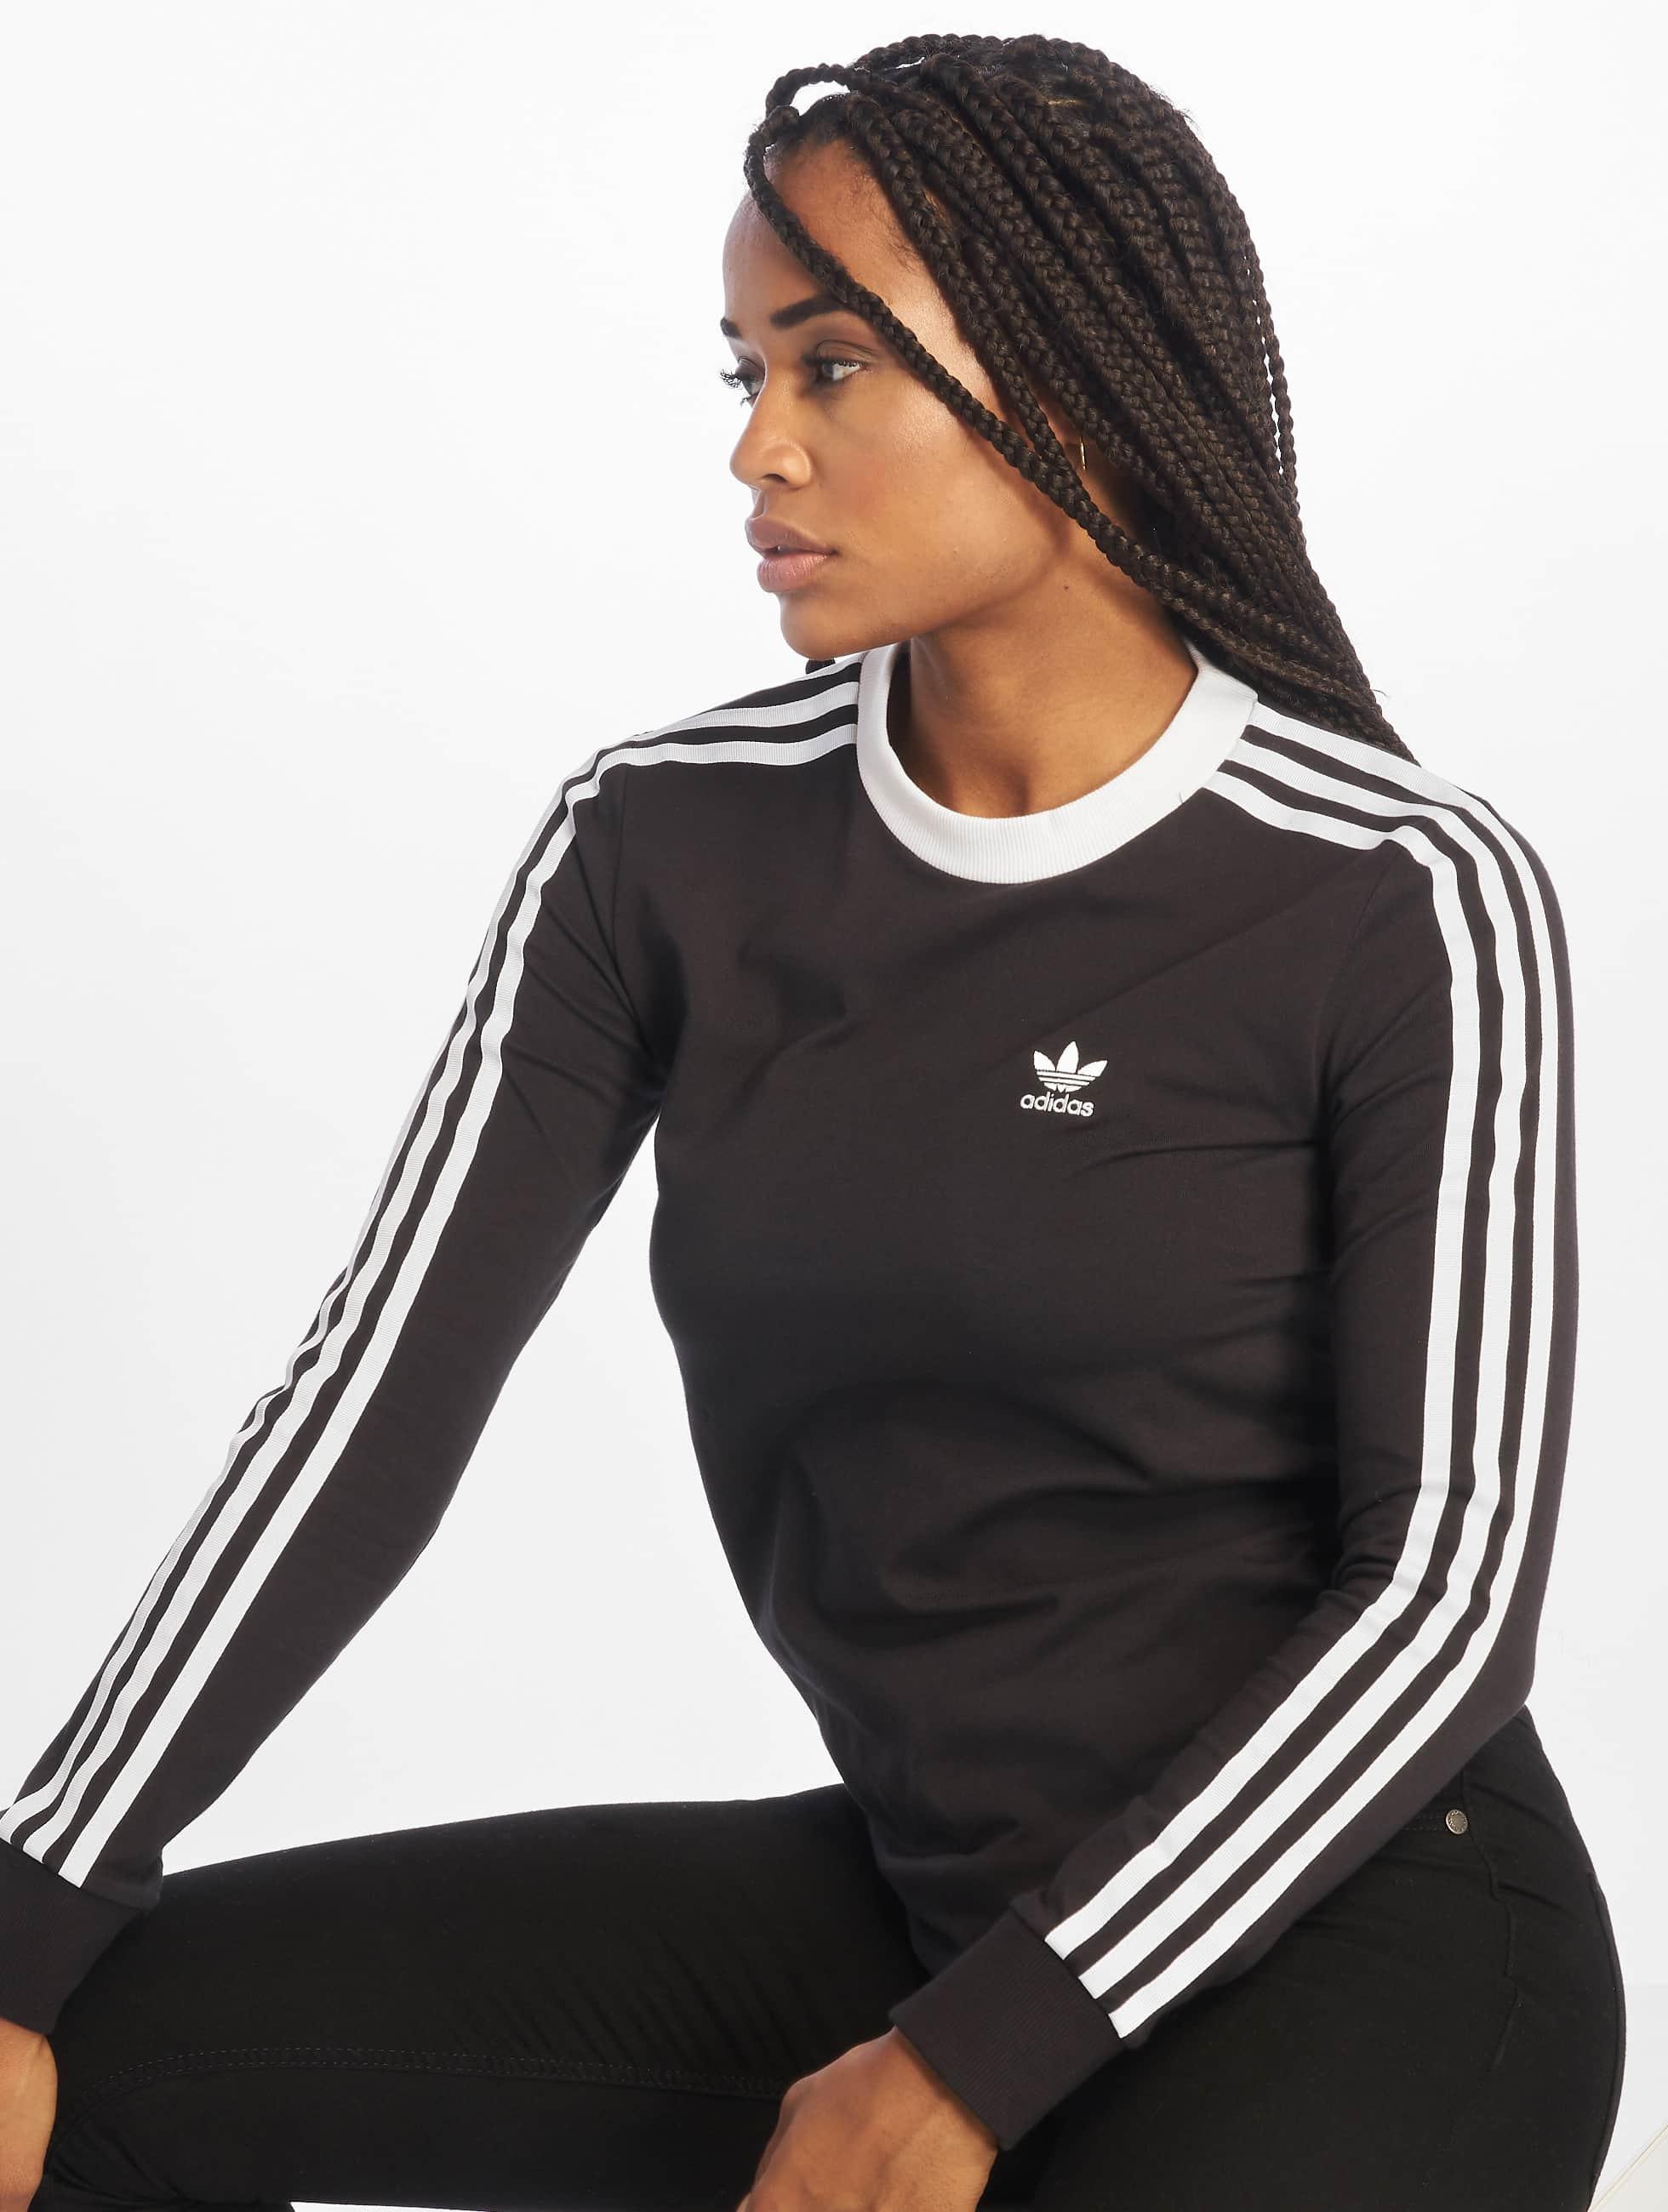 3 Longsleeve Adidas Black Originals Stripes MpqVSUzG